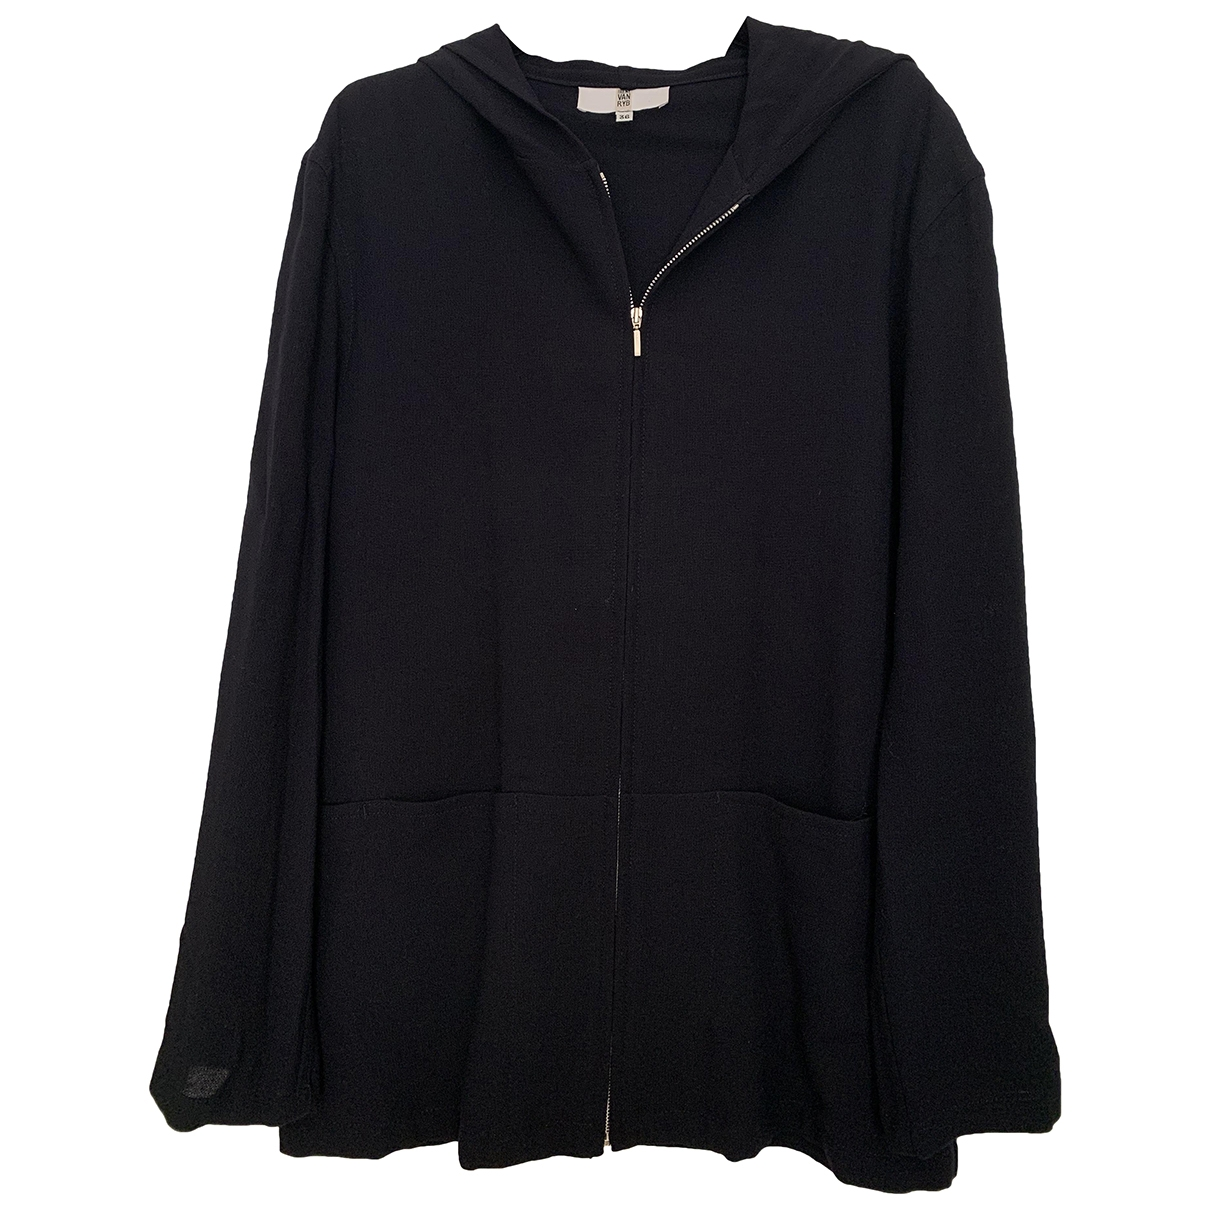 Irene Van Ryb \N Pullover in  Marine Wolle